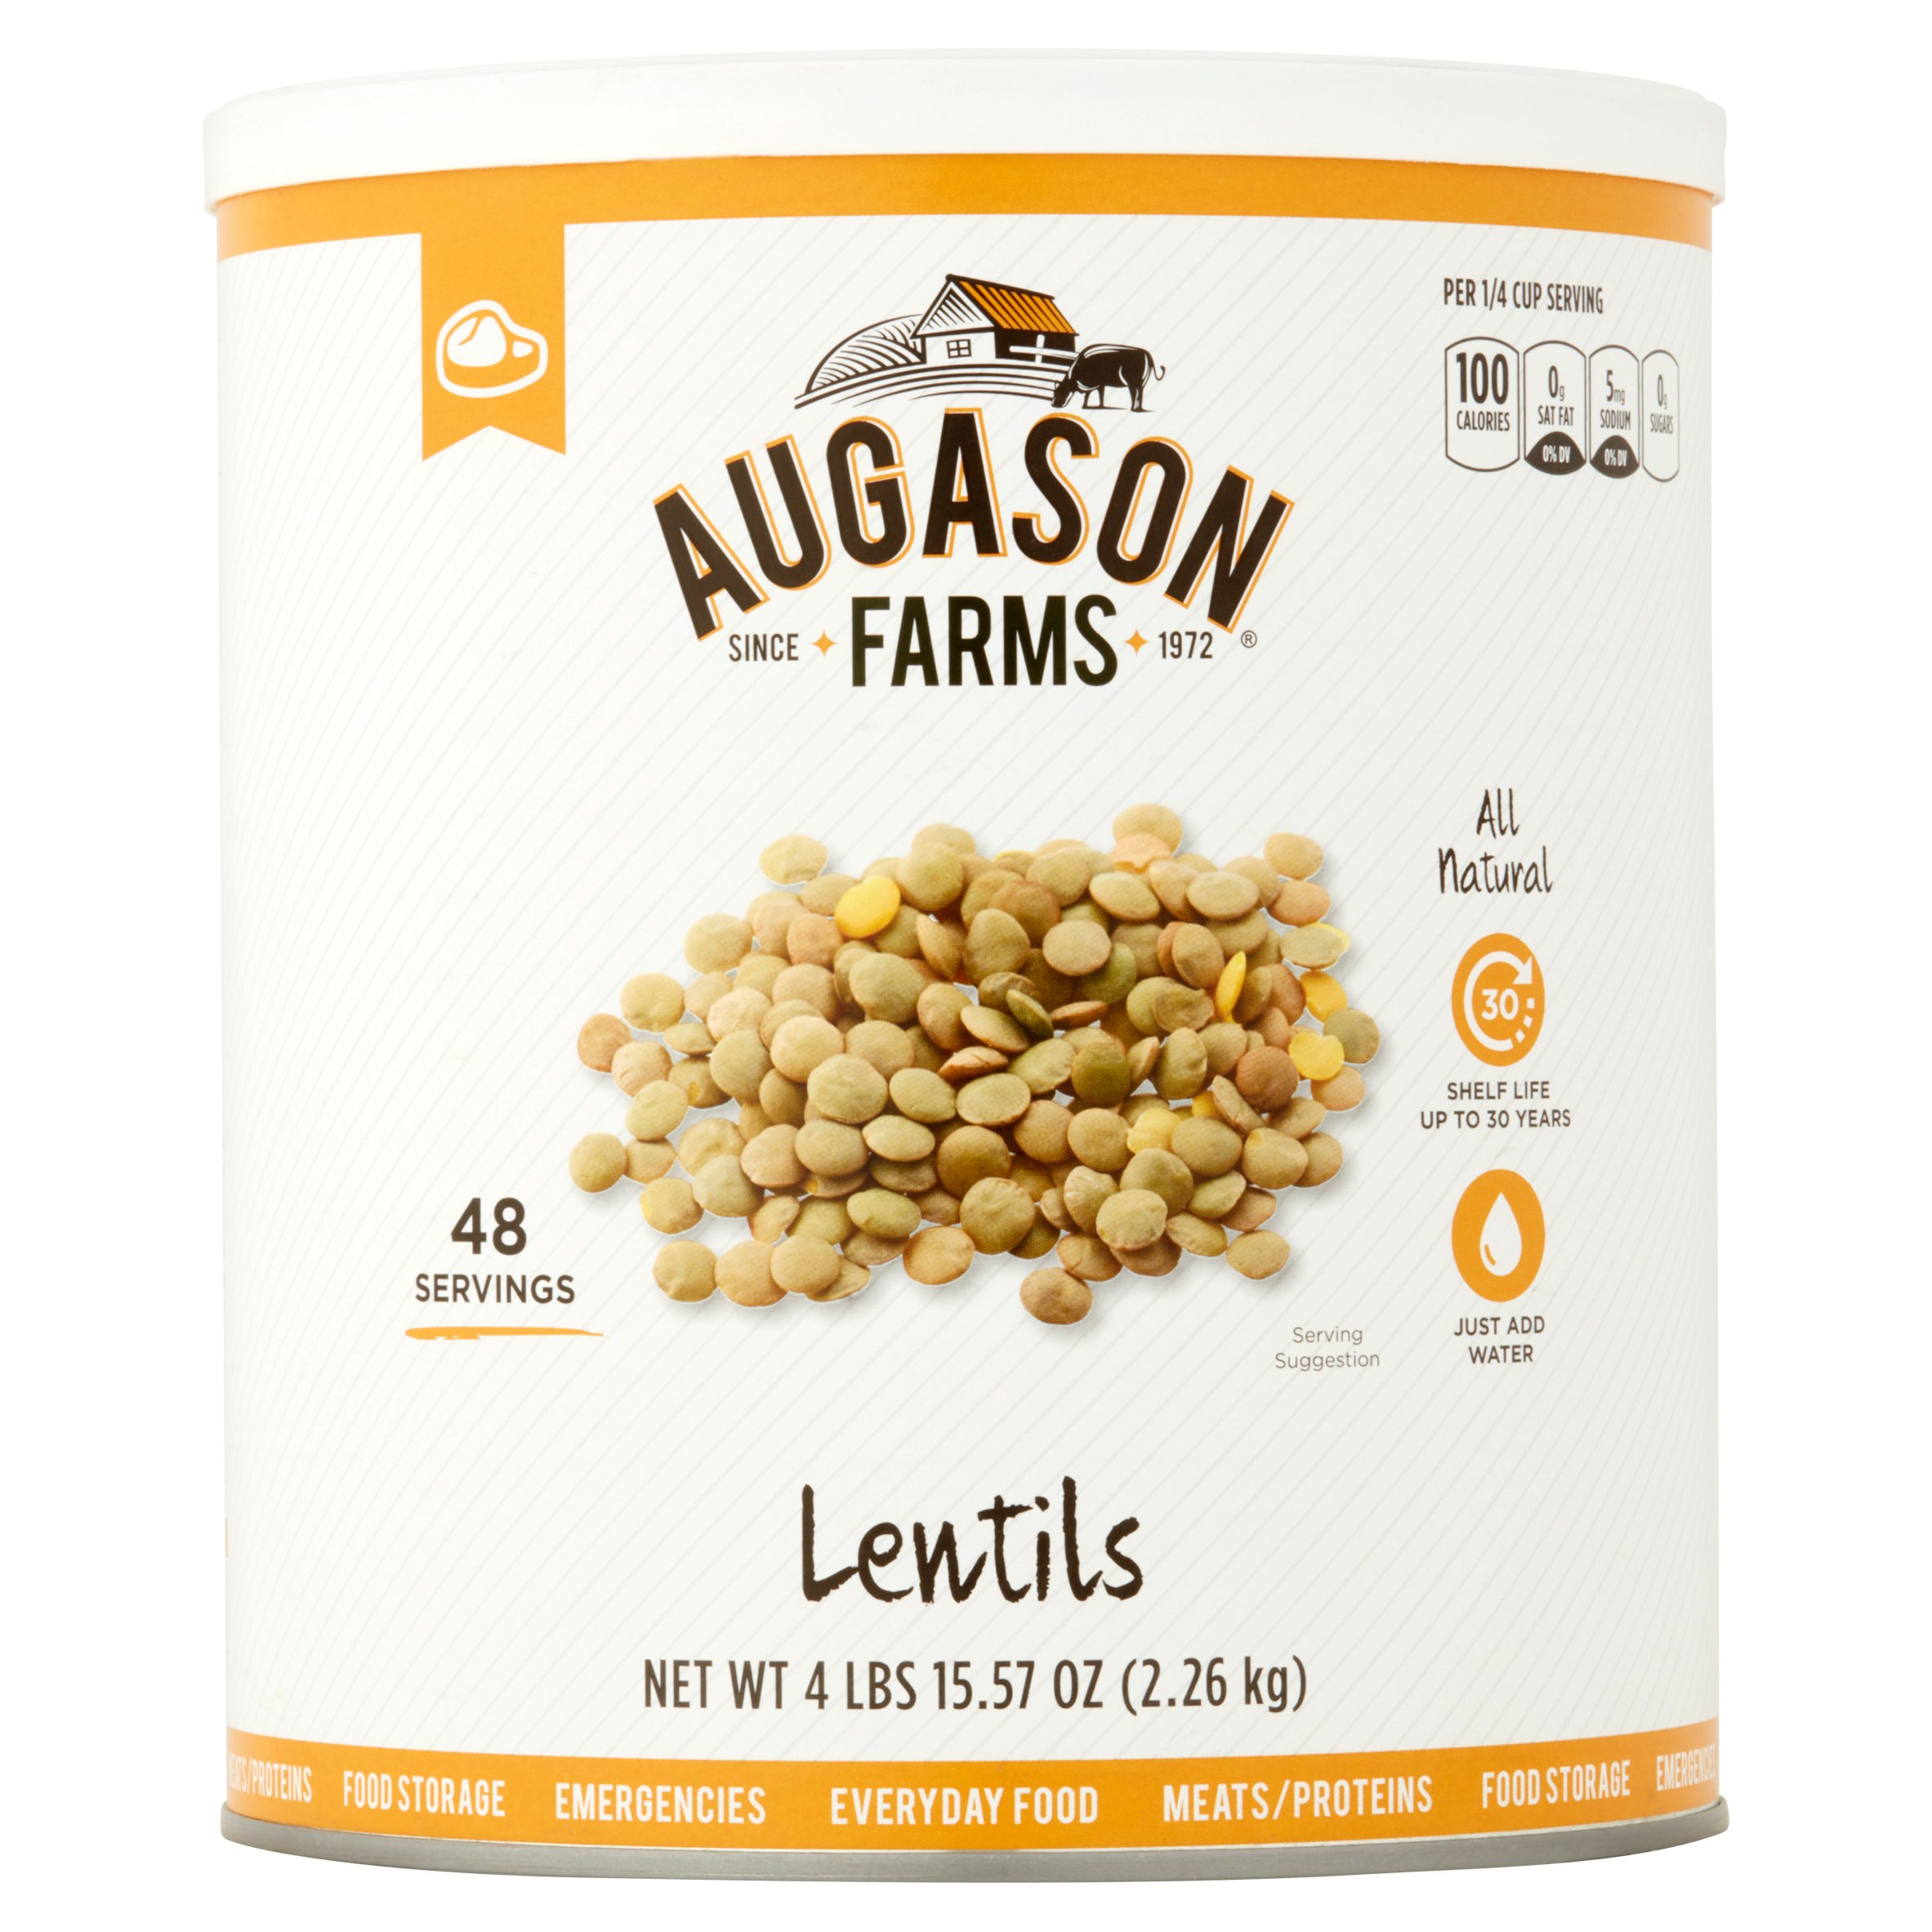 Augason Farms Lentils 80 oz #10 Can by Blue Chip Group